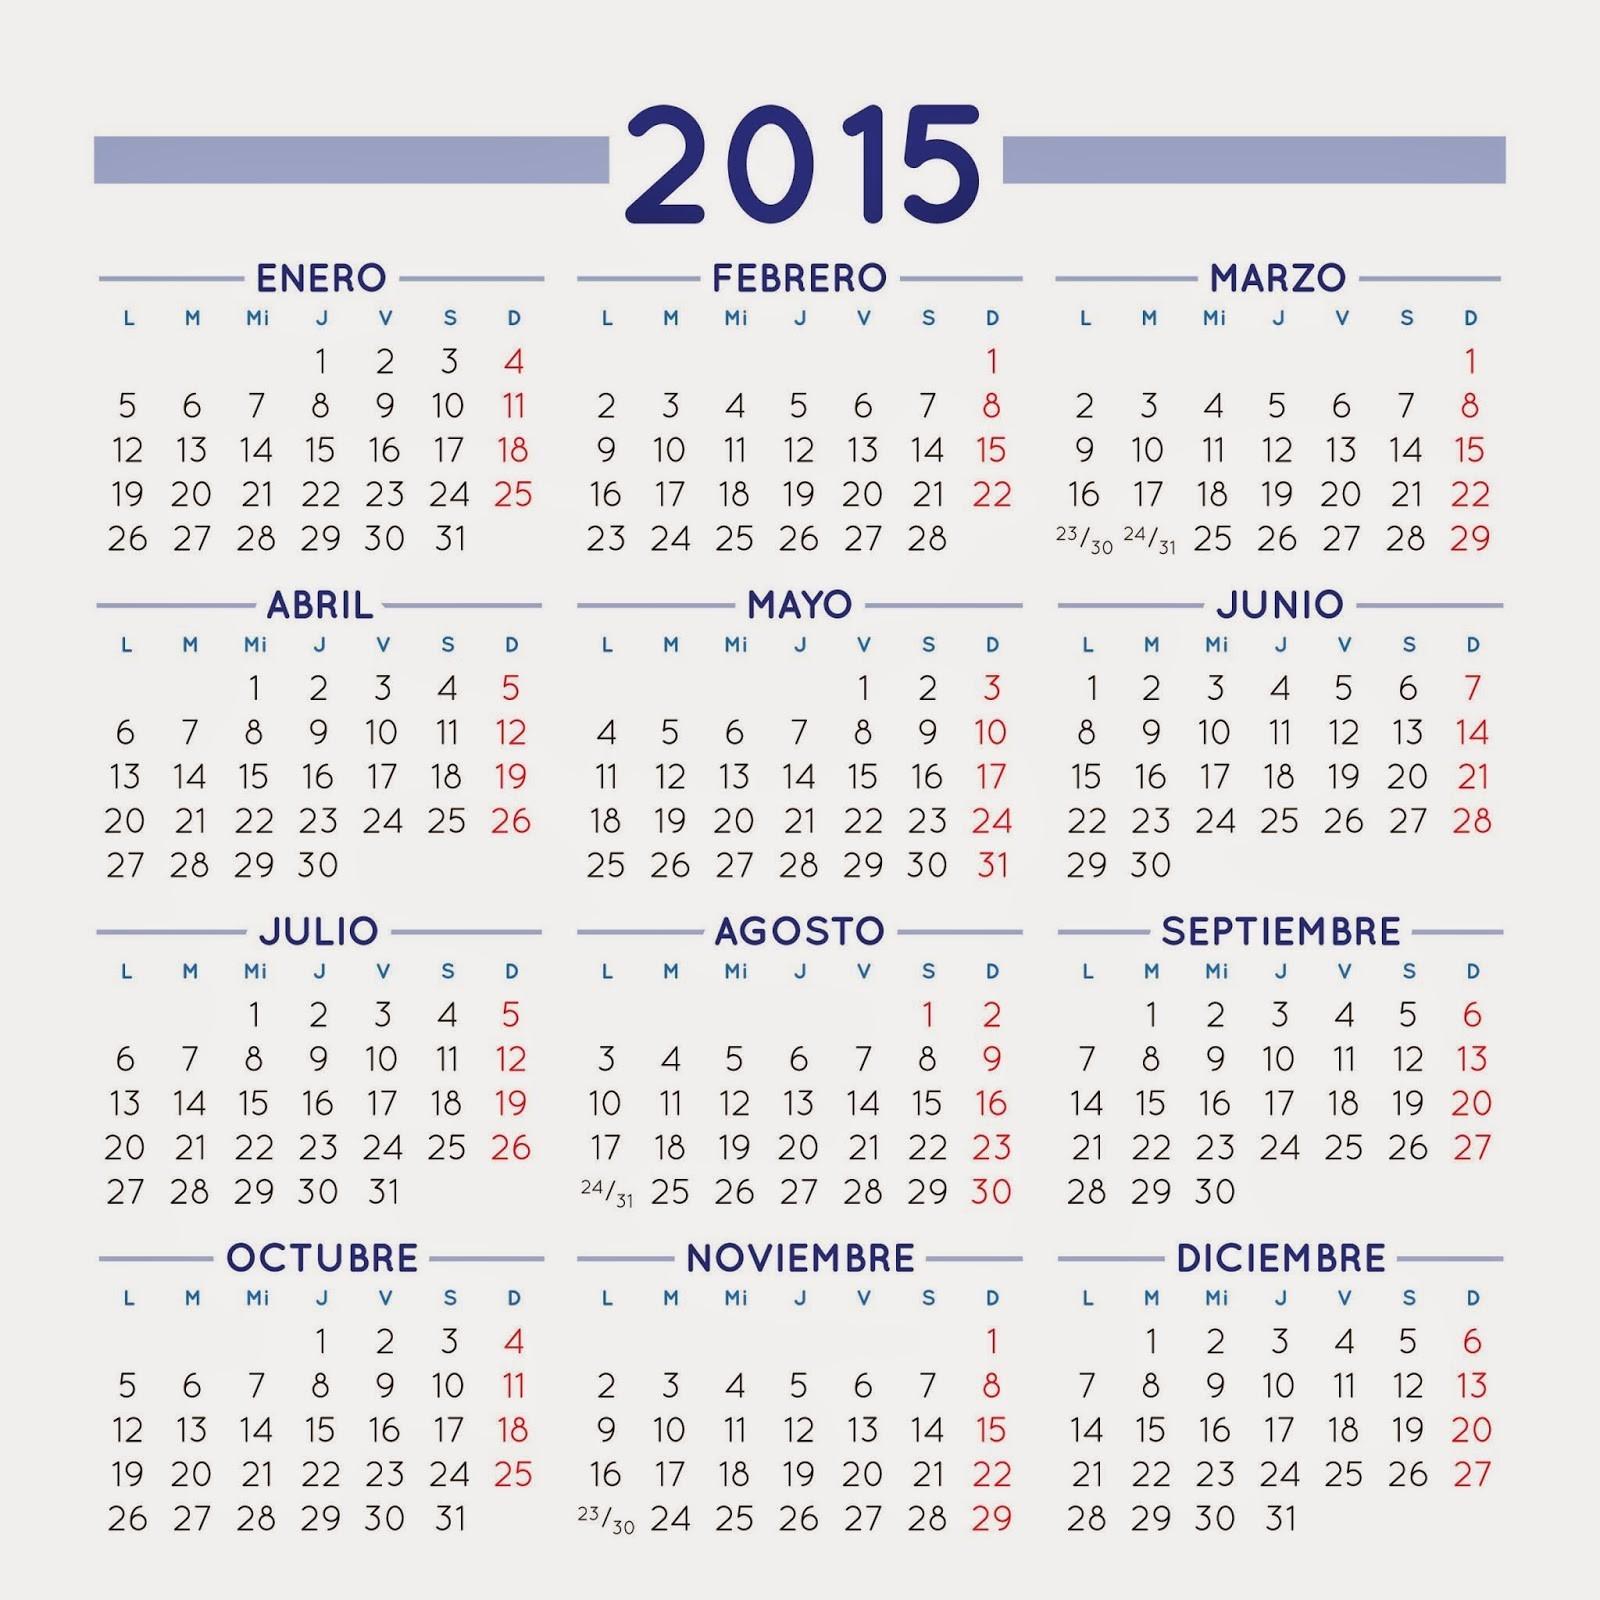 calendario 2017 para imprimir con feriados en argentina mas recientemente liberado calendarios de navidad calendarios de navidad libros navidad of calendario 2017 para imprimir con feriados